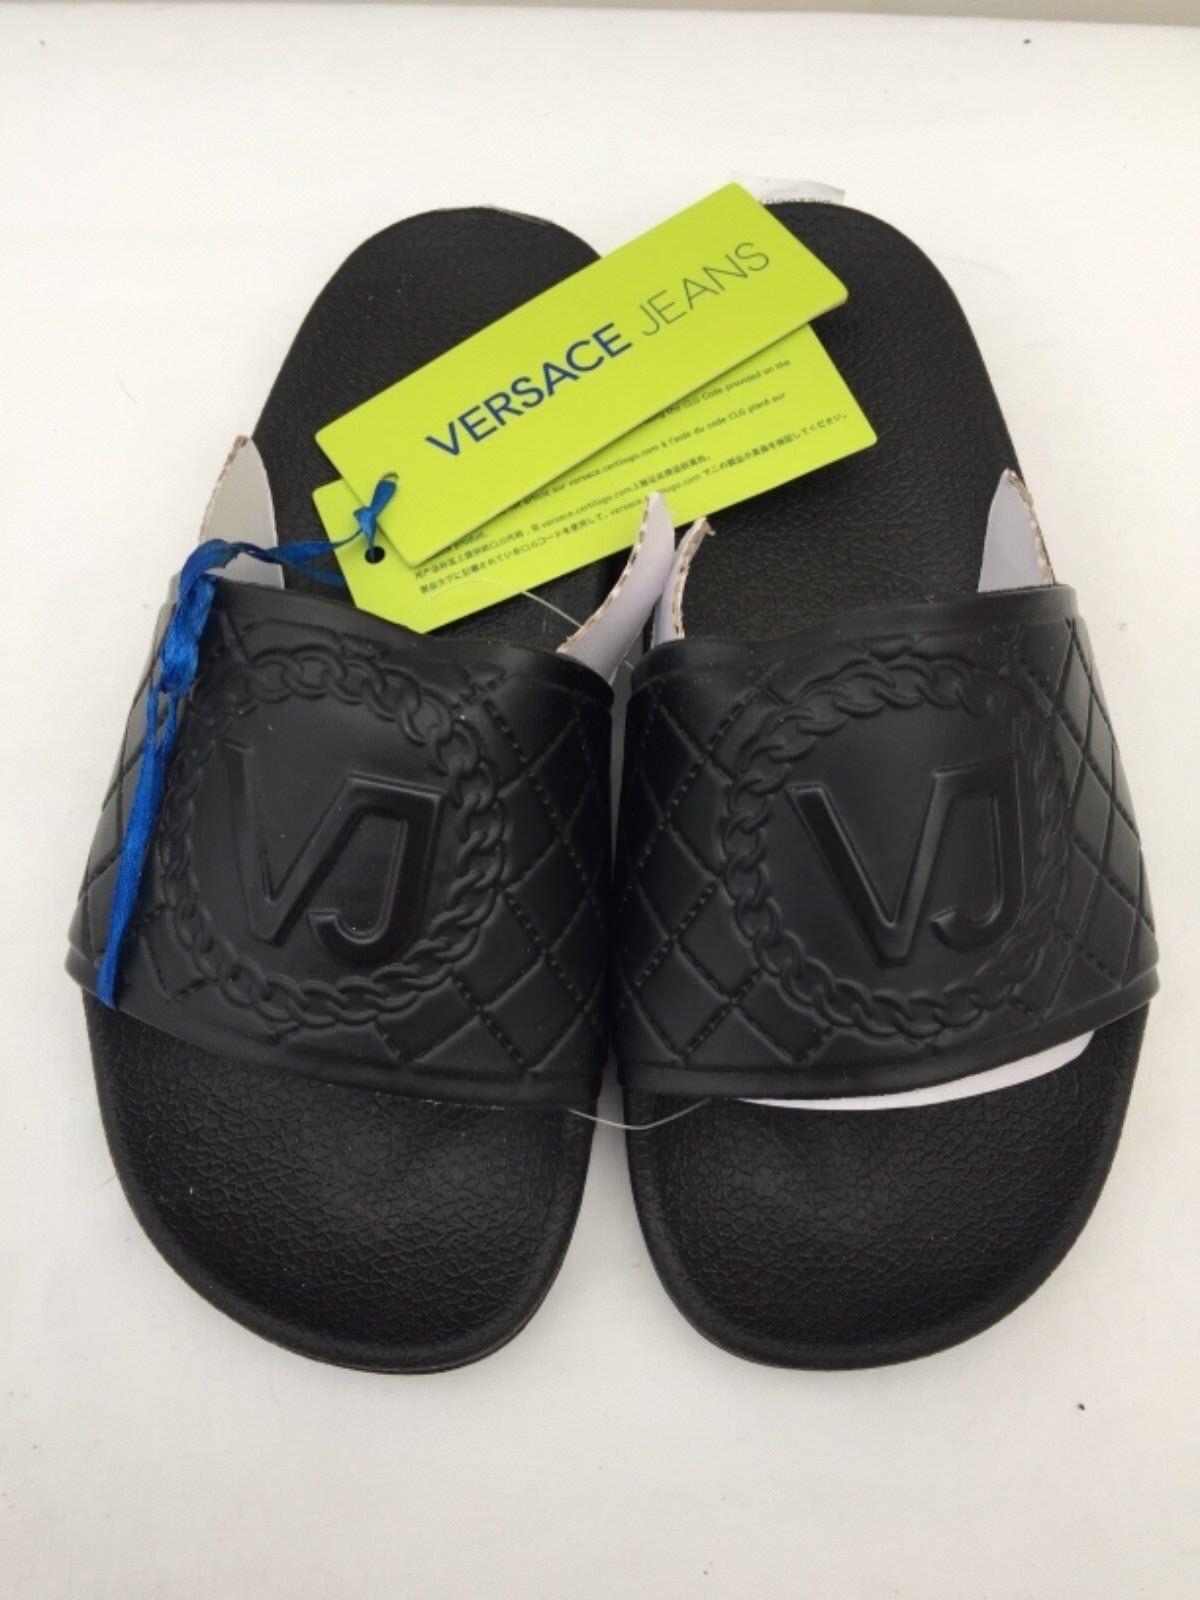 VERSBCE JEBNS Black Heavy Rubber Large Logo Sandals/Slides UK 2.5, 3, 6, 7 BNIB